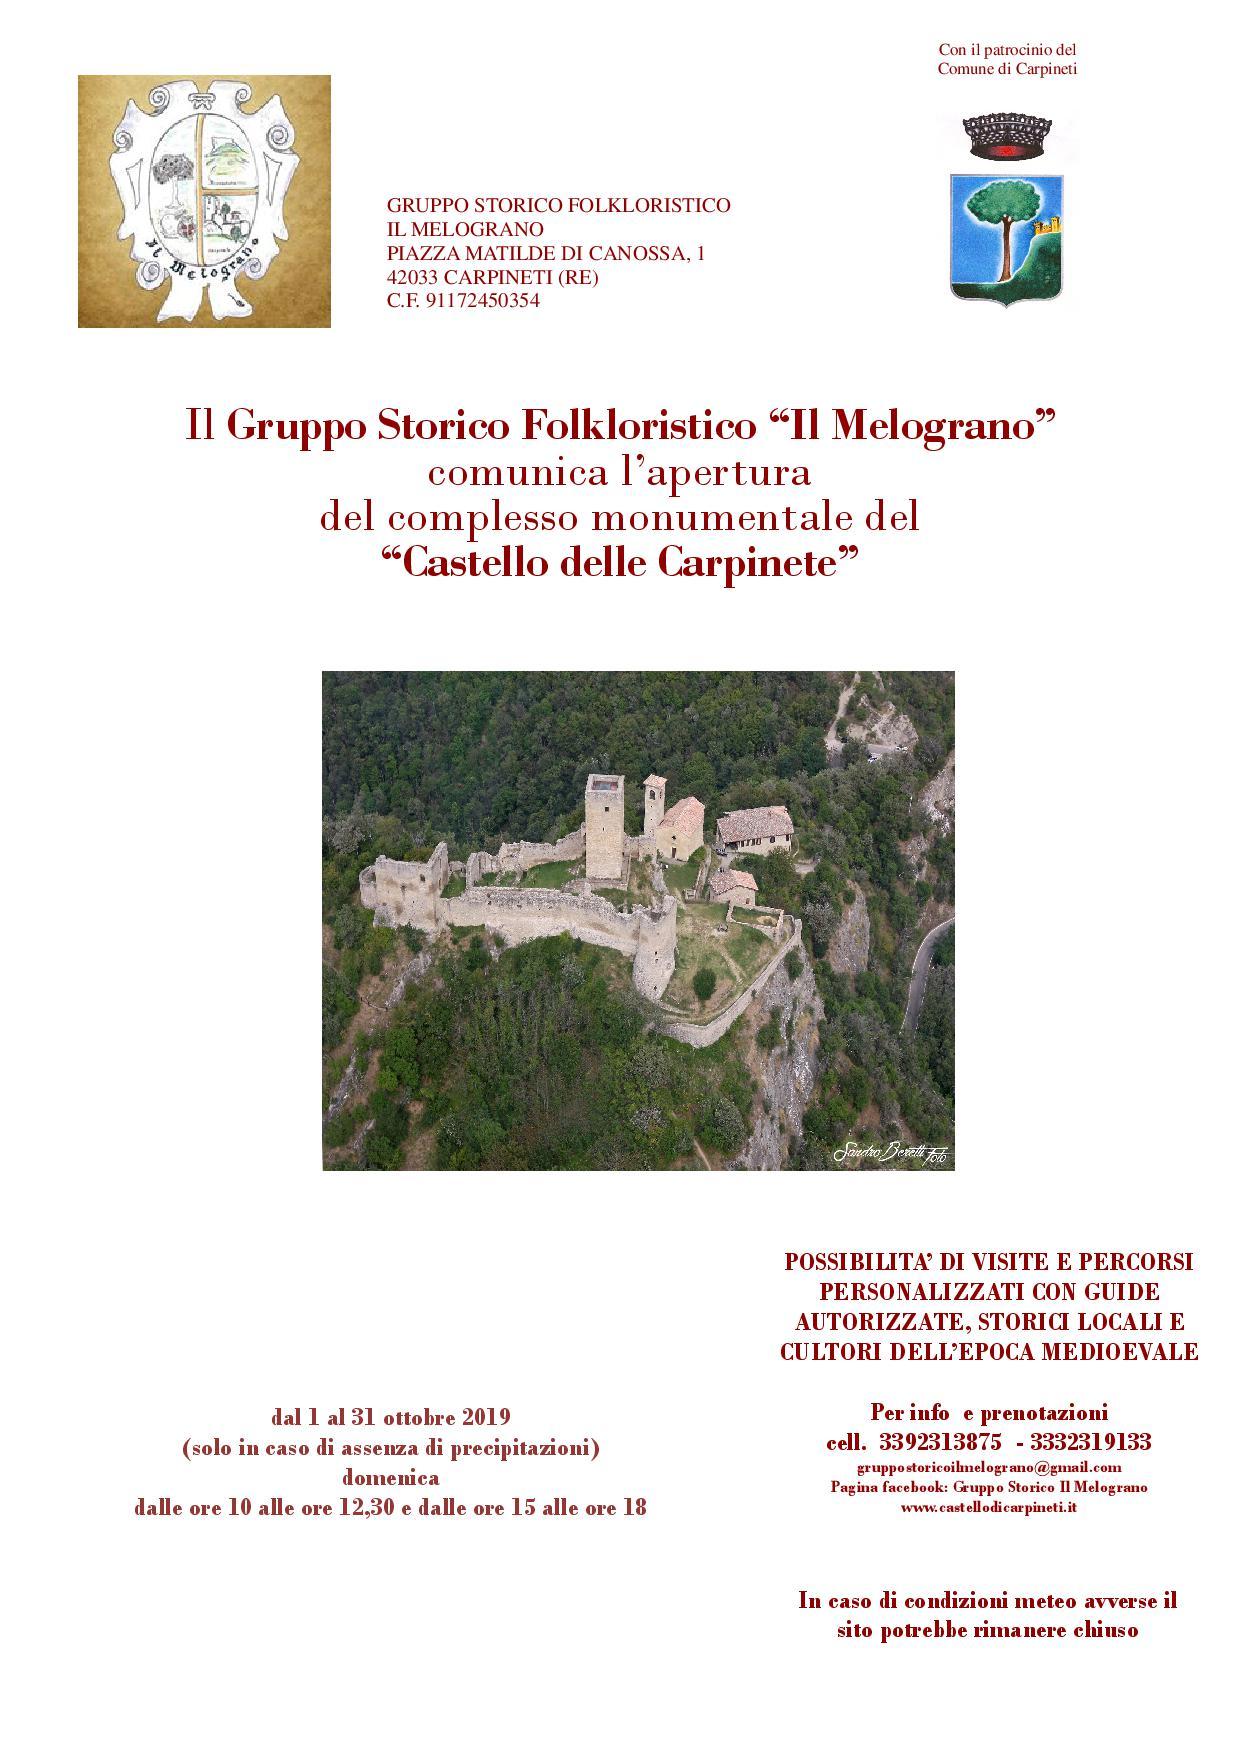 orari apertura castello ottobre